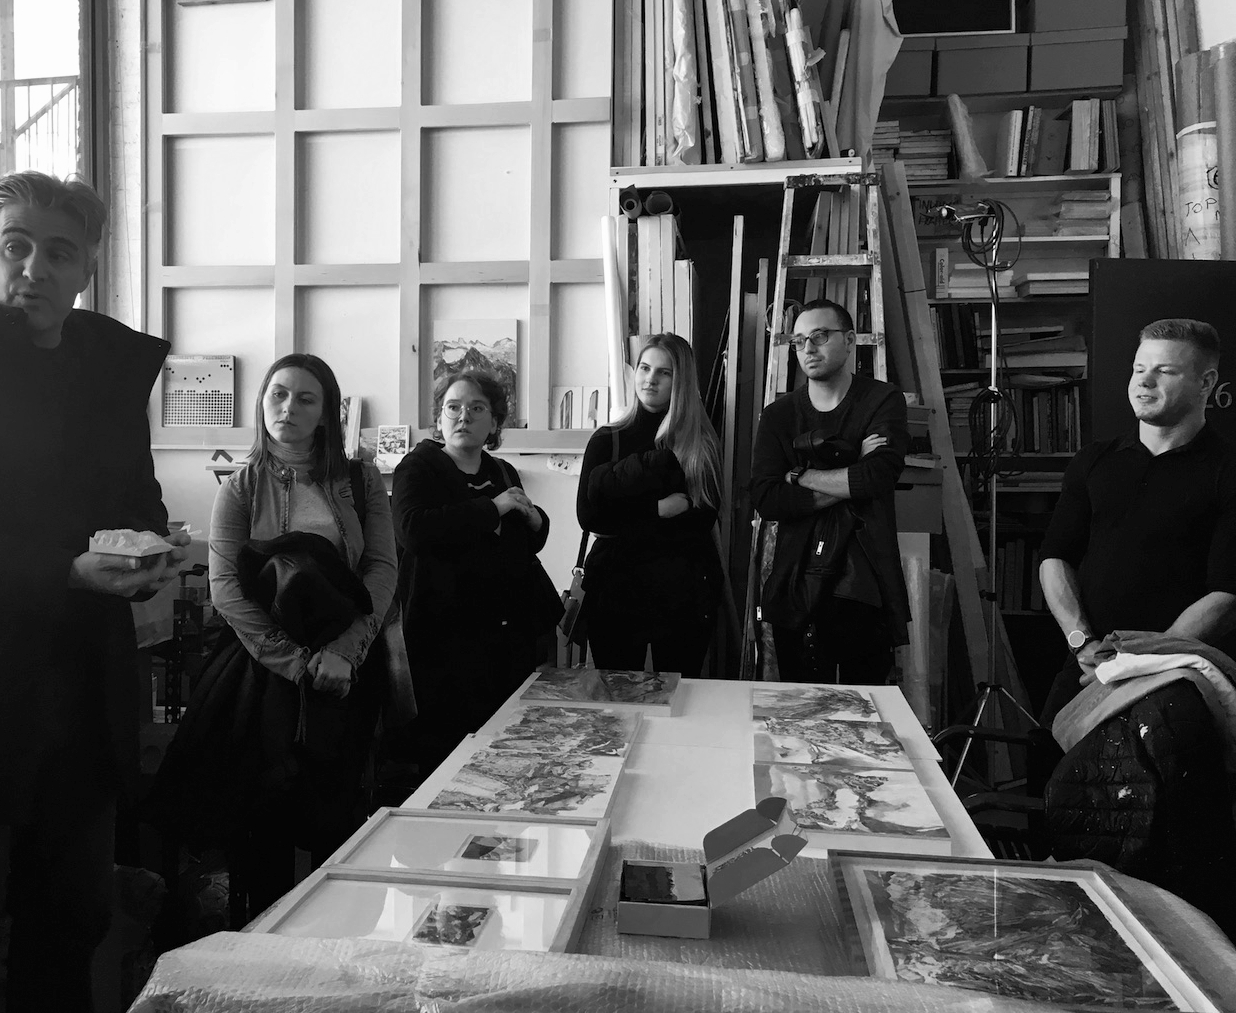 SIA-NY visit to RVecchio studio.02 12-07-17.jpg